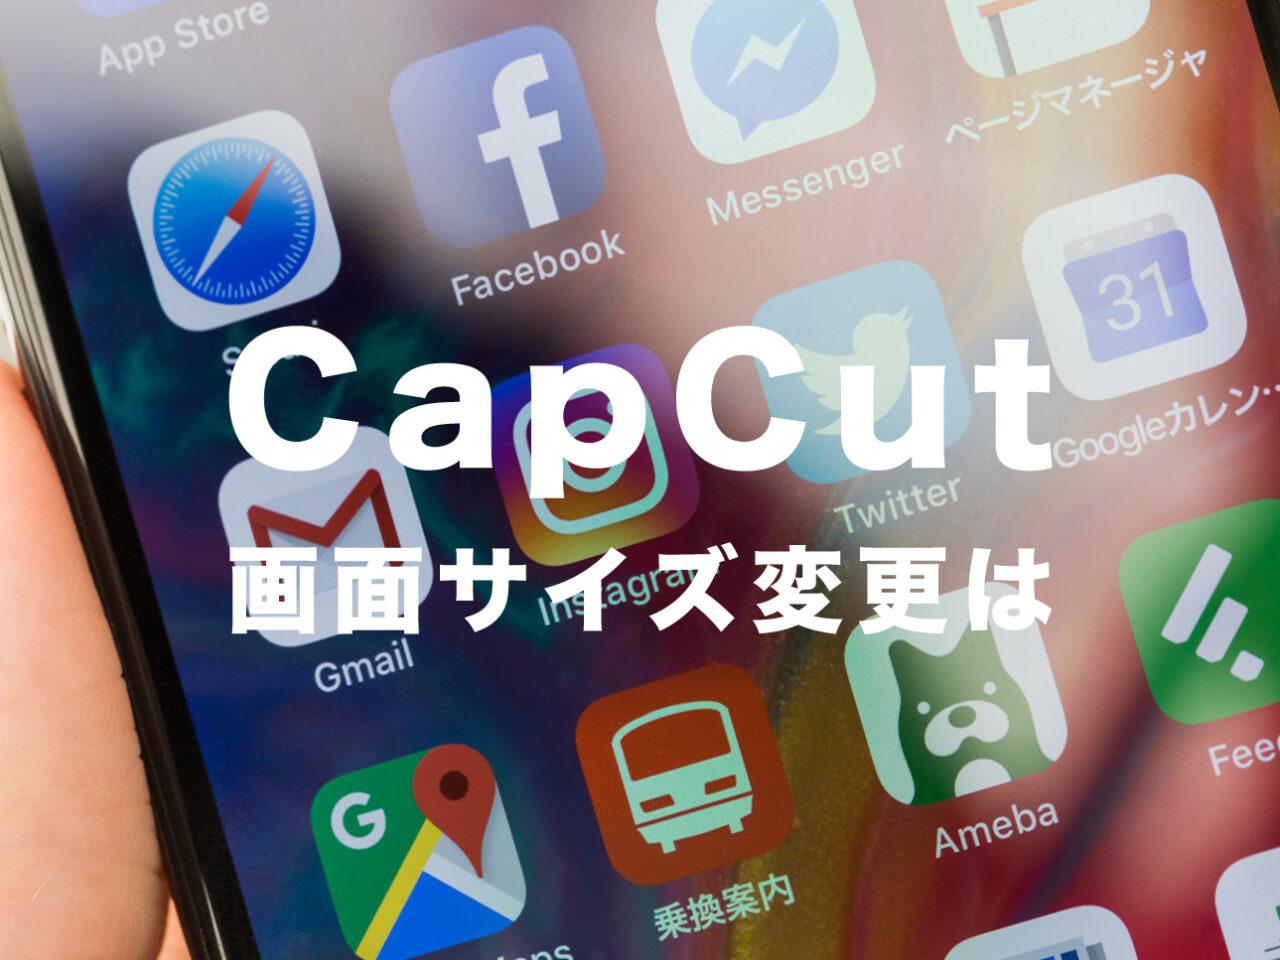 CapCut(キャップカット)で画面サイズや比率を変更する方法を解説!のサムネイル画像